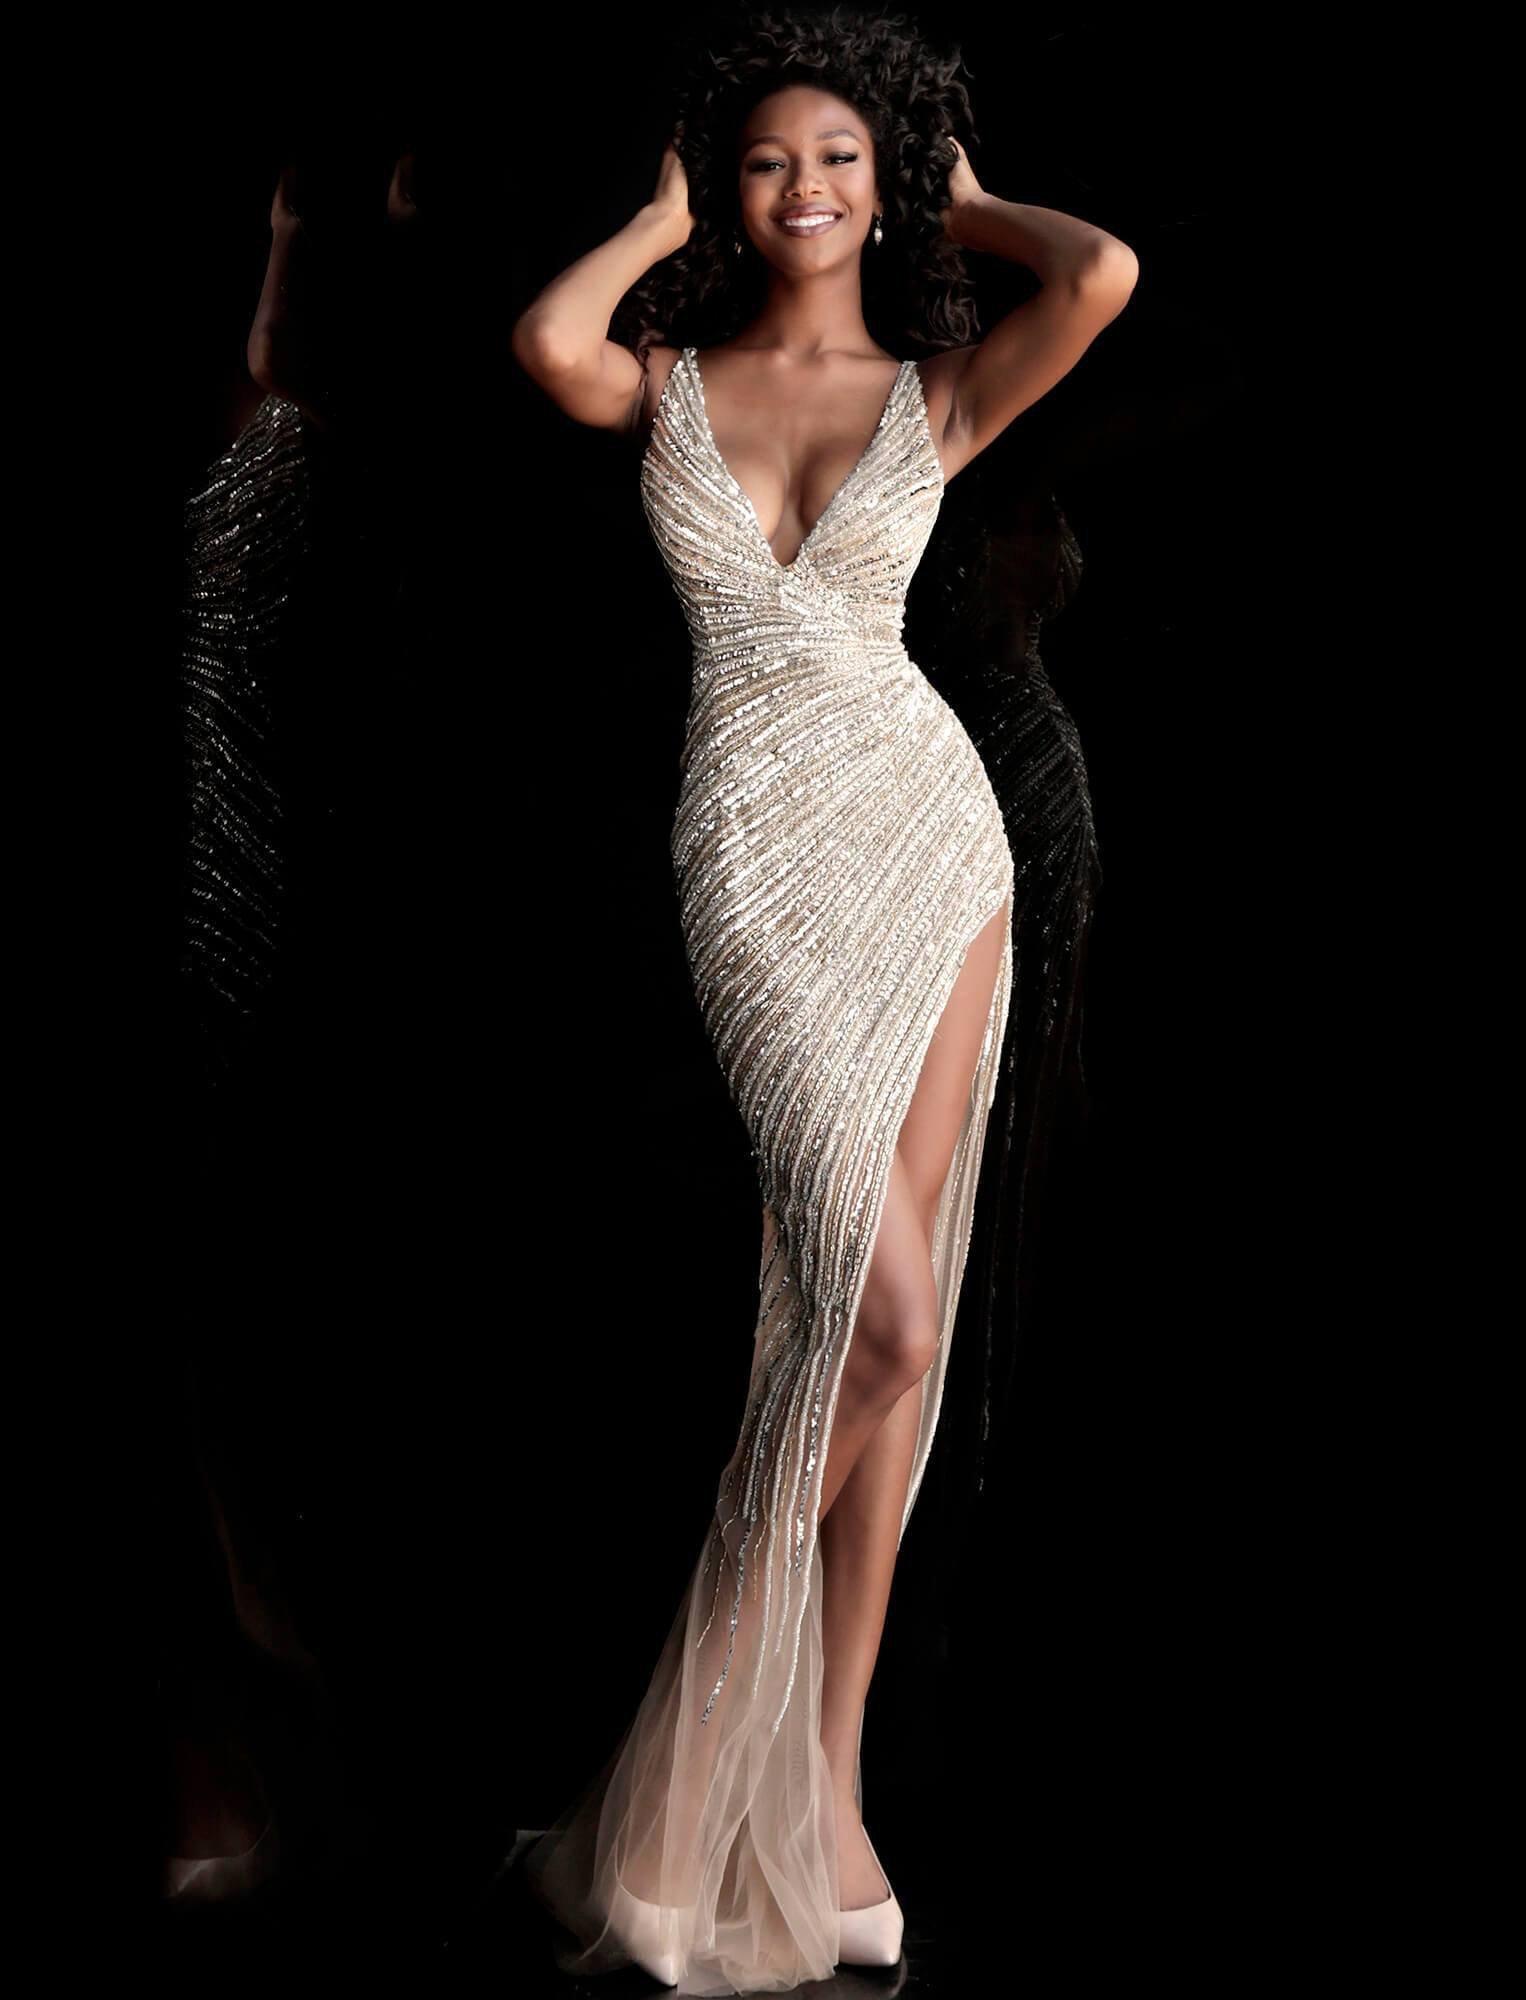 Jovani - 63405 Asymmetrical Beaded Illusion High Slit Gown